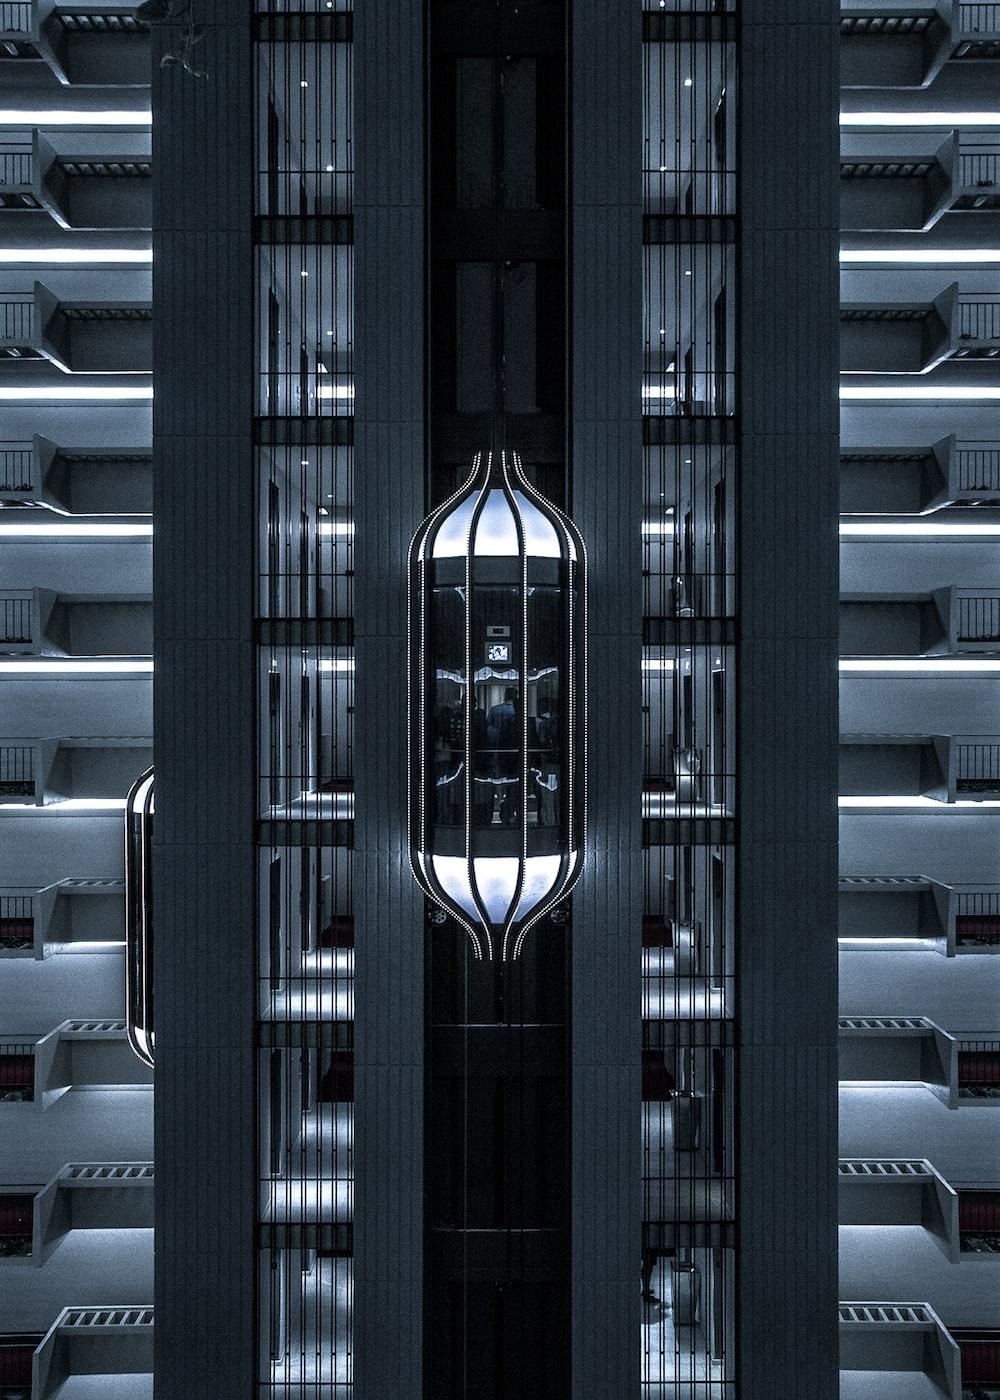 urban photo of an elevator